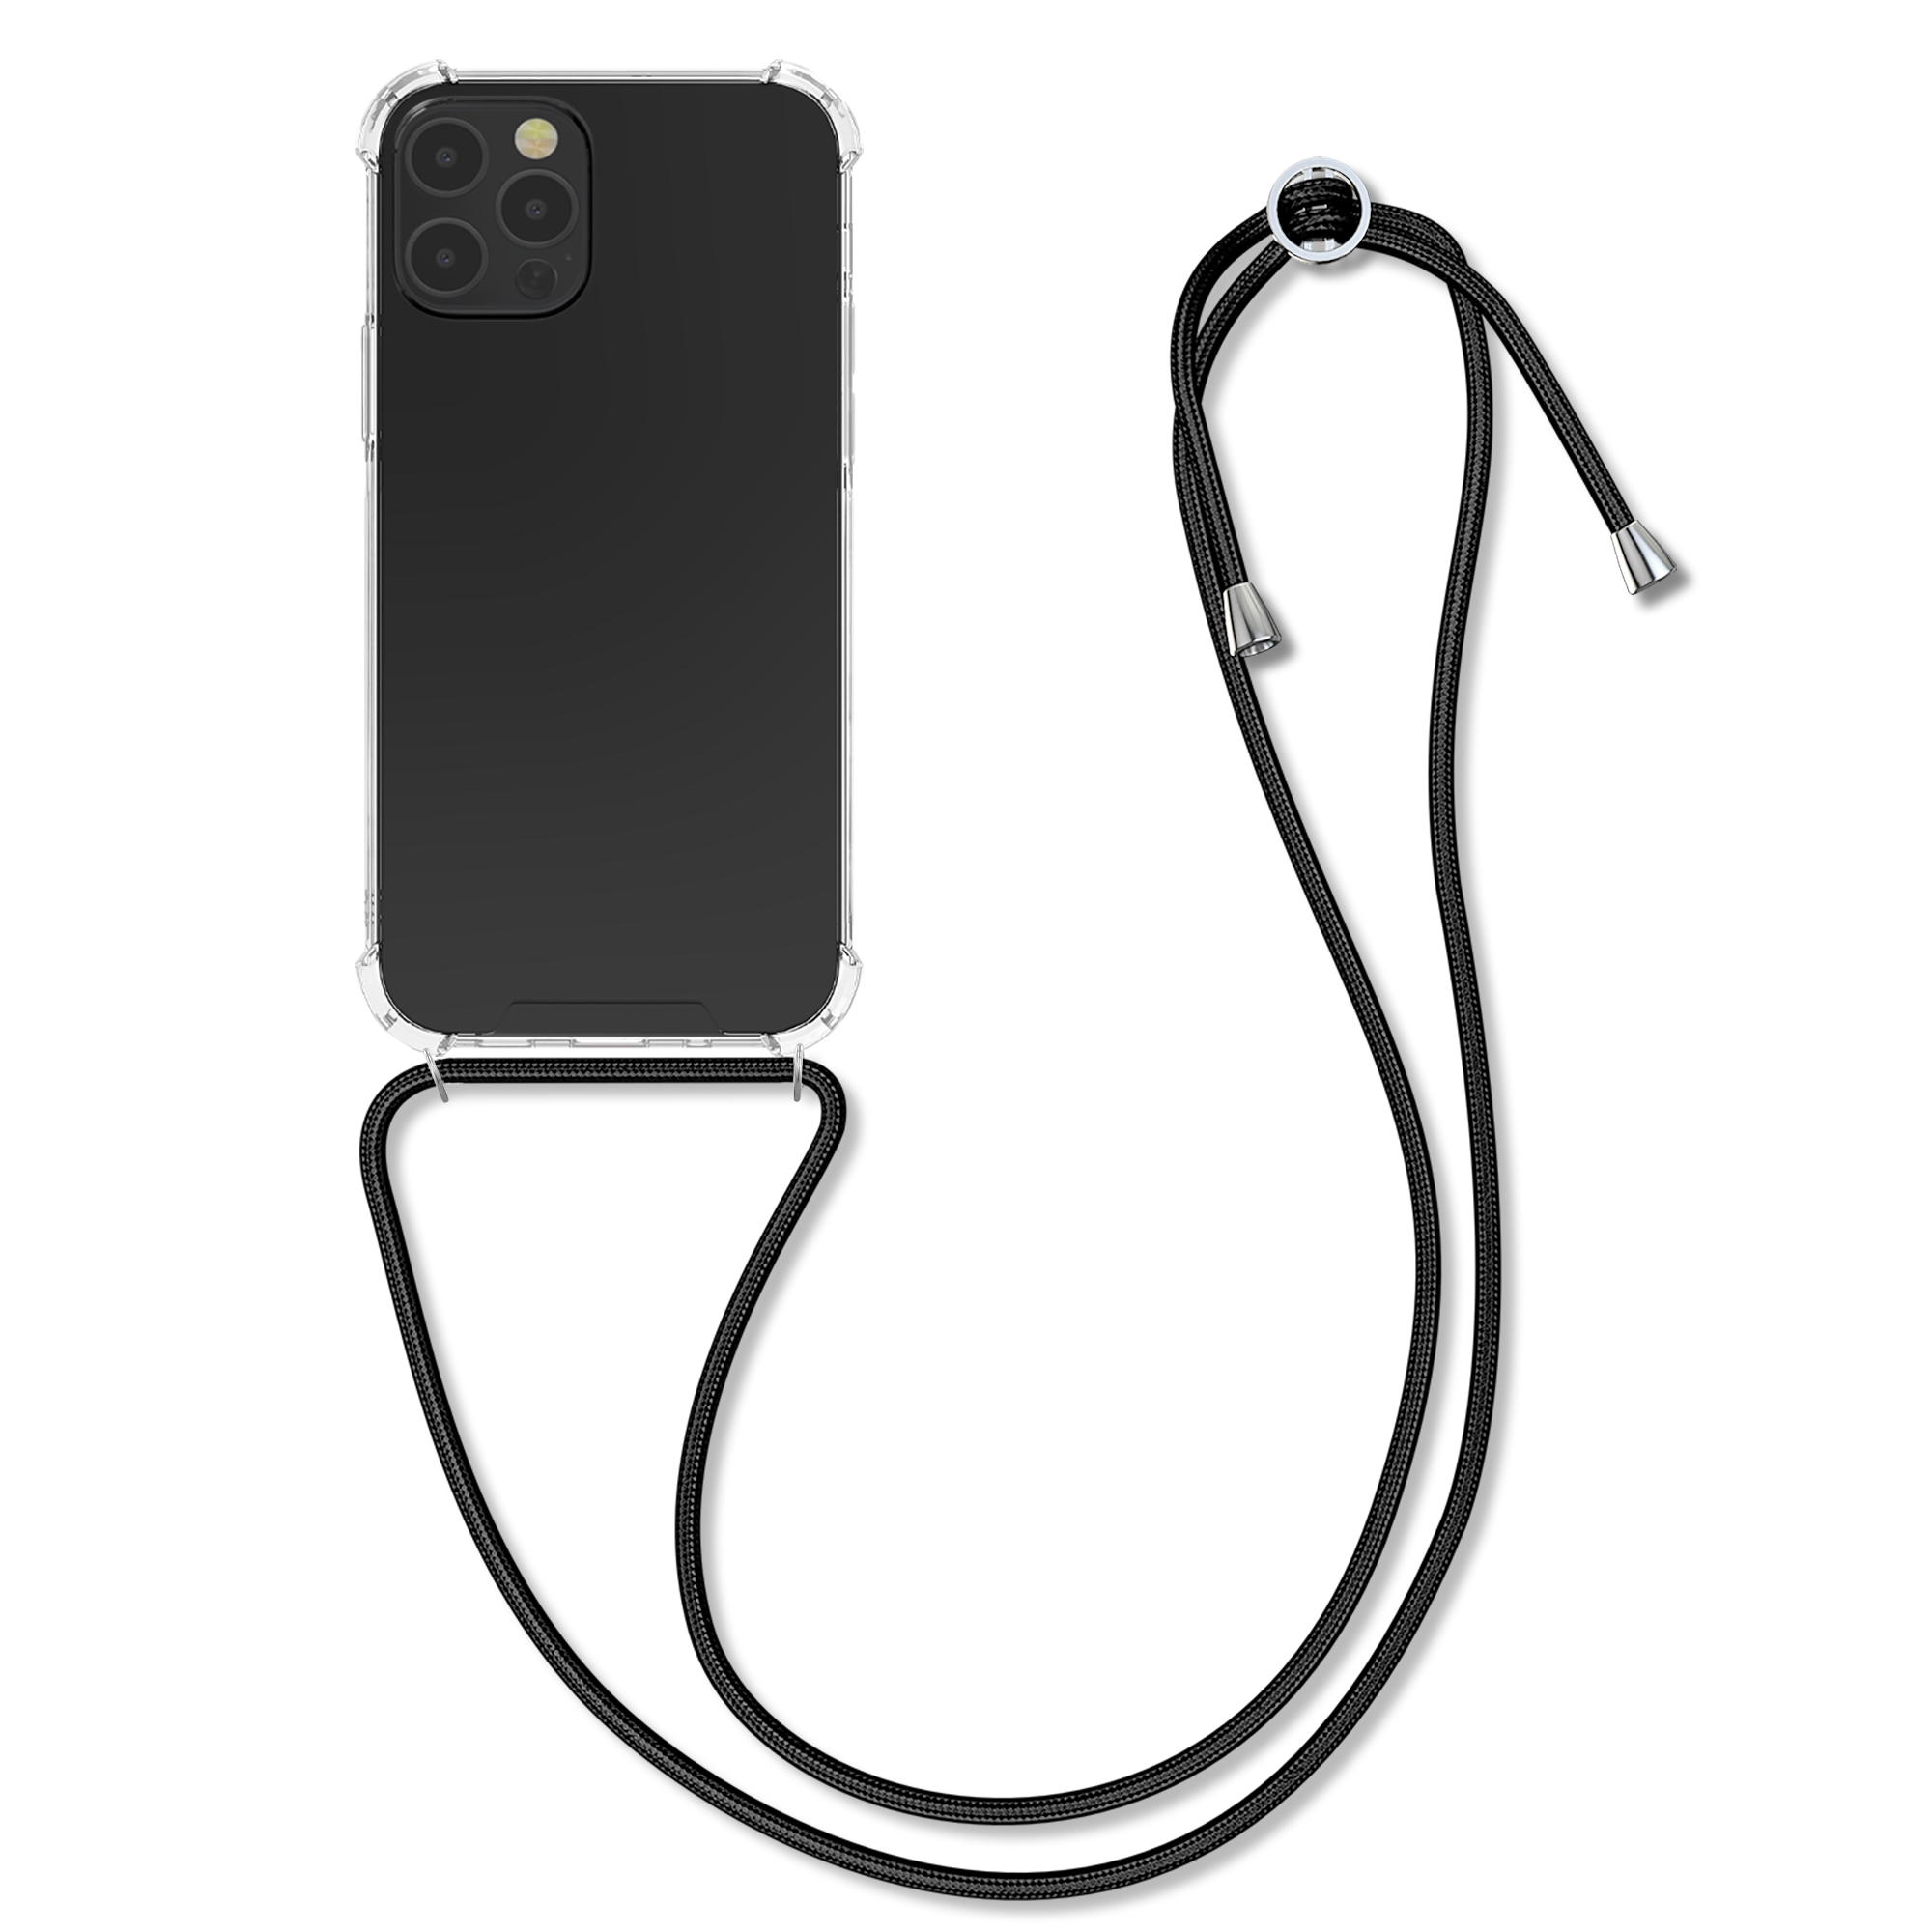 Kvalitní silikonové TPU pouzdro pro Apple iPhone 12 / 12 Pro - Transparent | Black